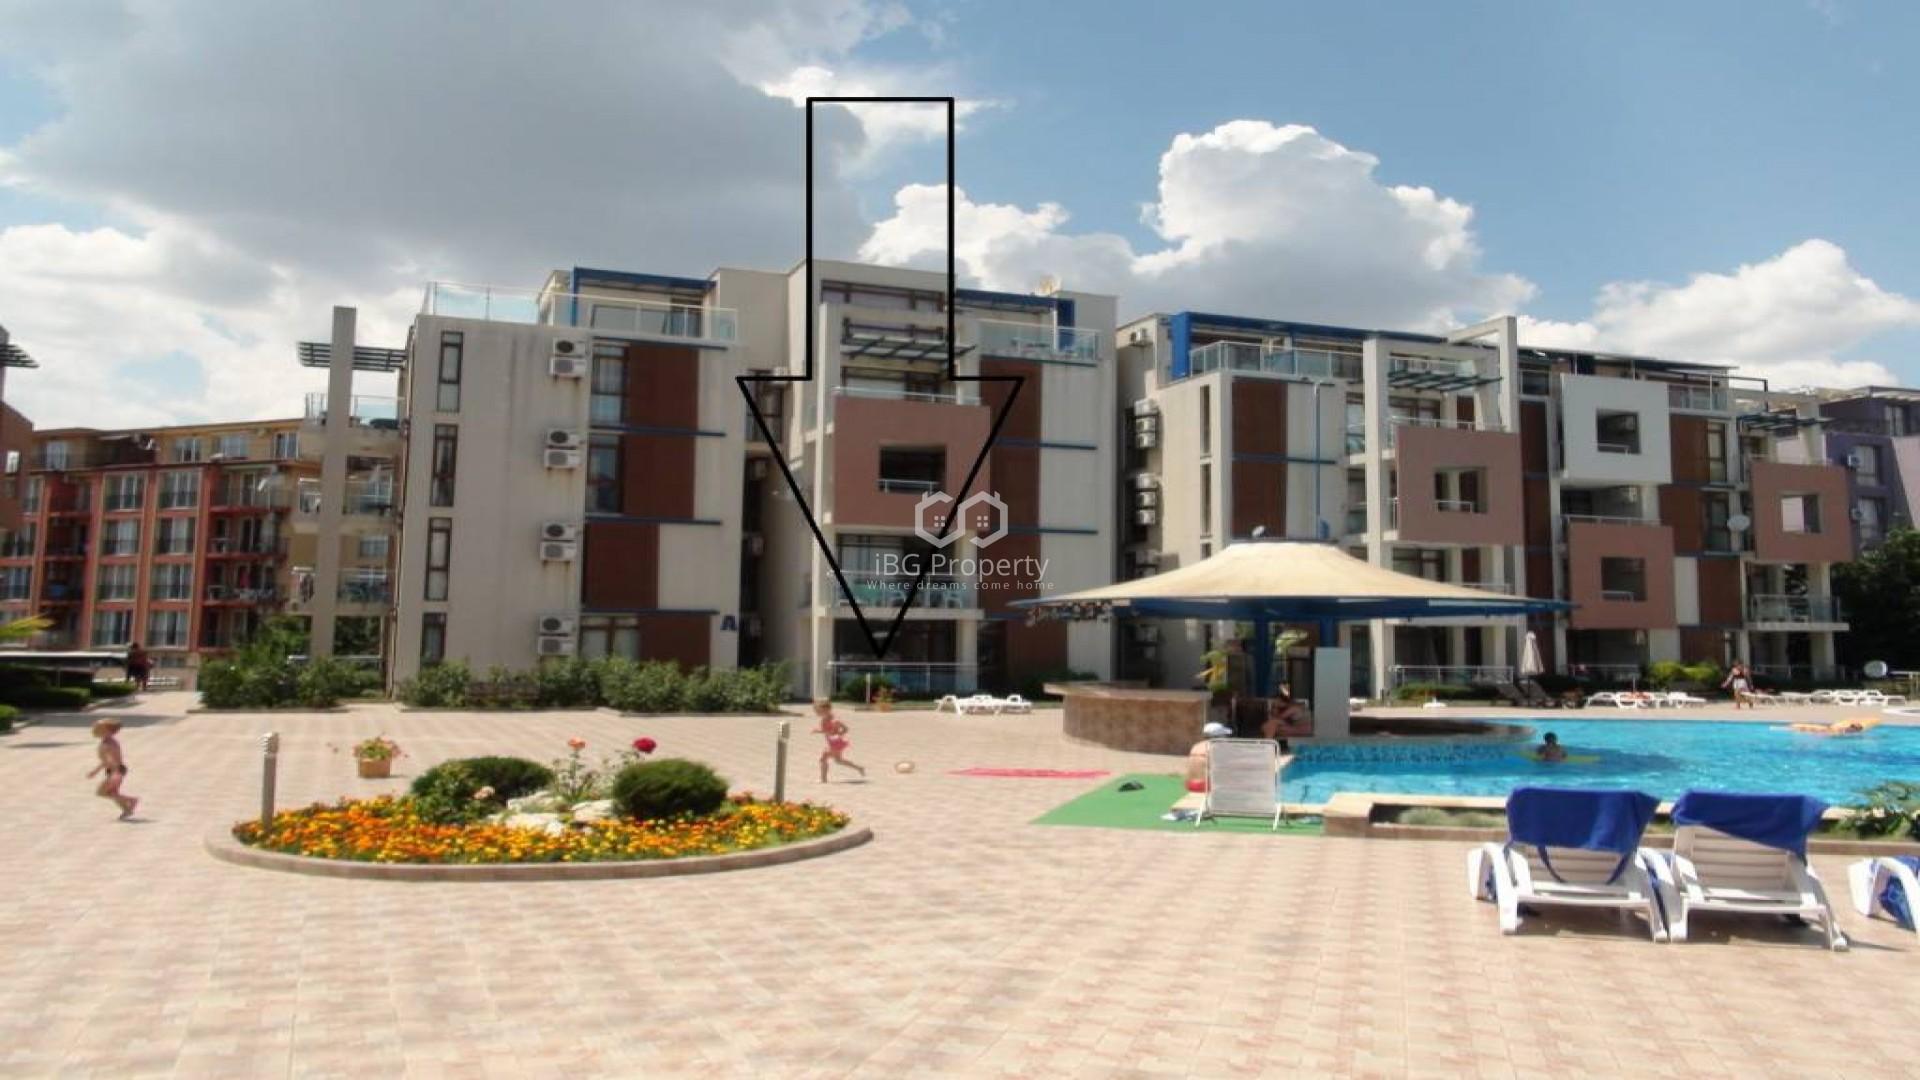 Двухкомнатная квартира Солнечный берег  66 m2